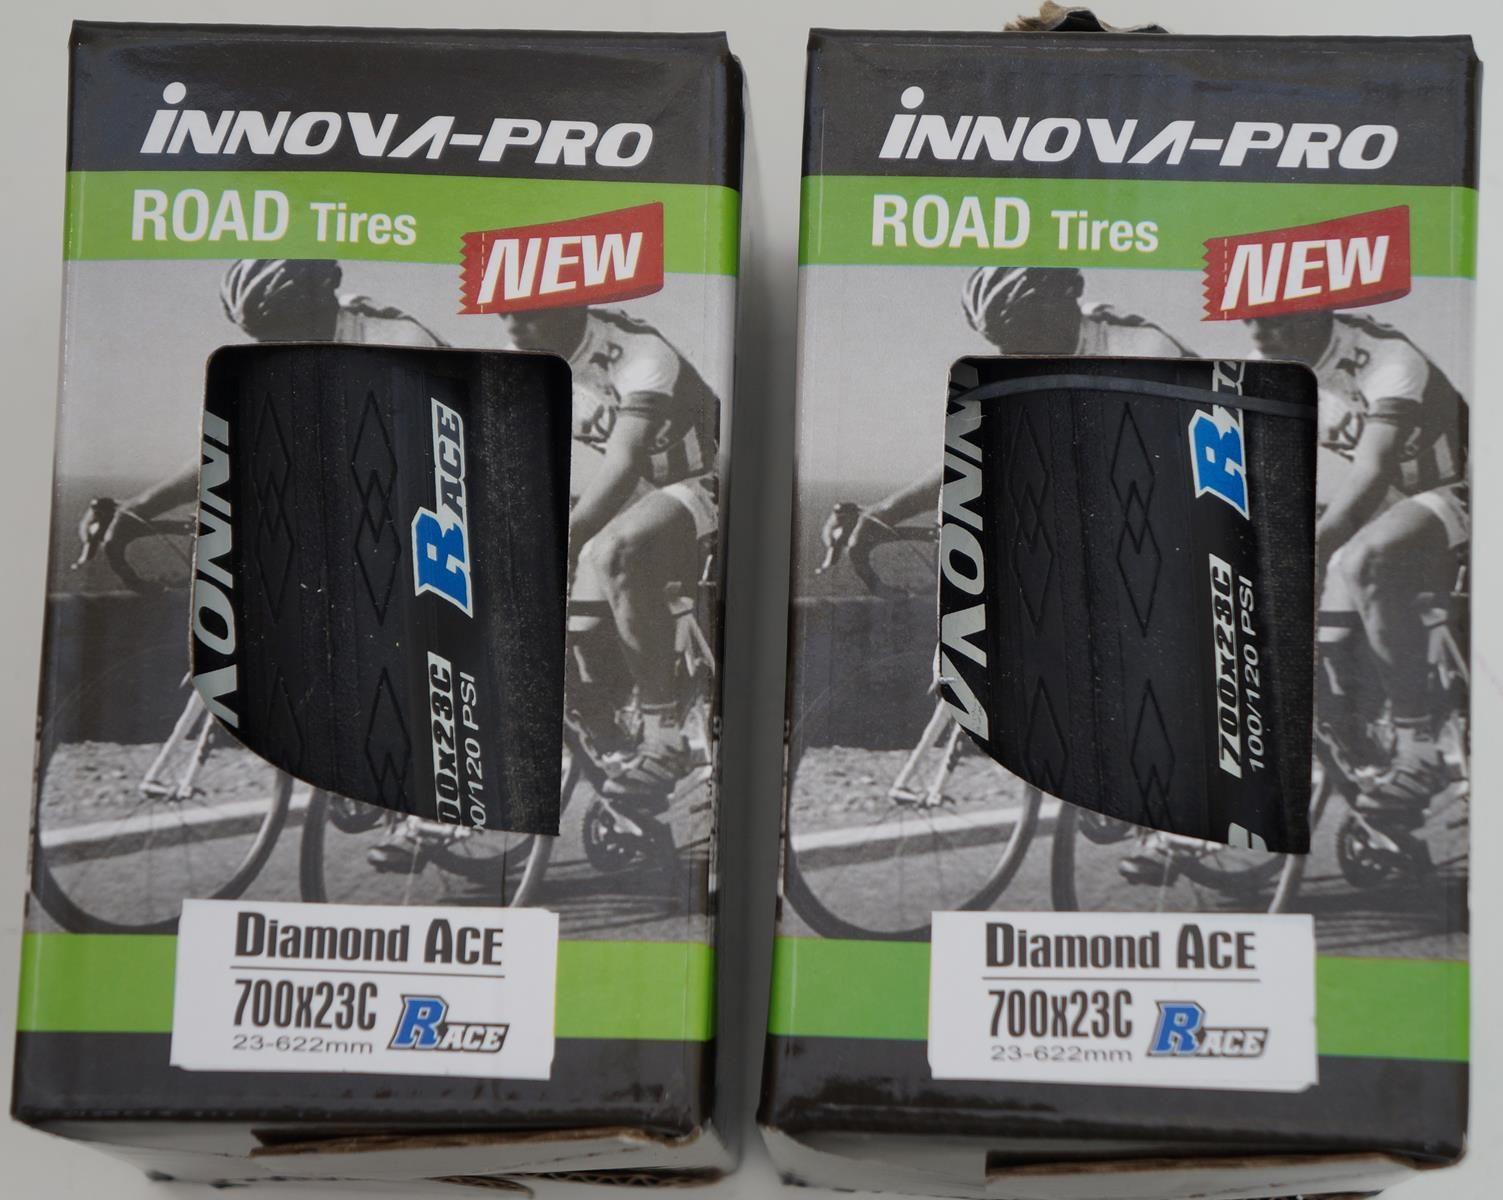 2 Pneus Innova Pro Diamond Ace 700x23 em Kevlar para Speed Preto